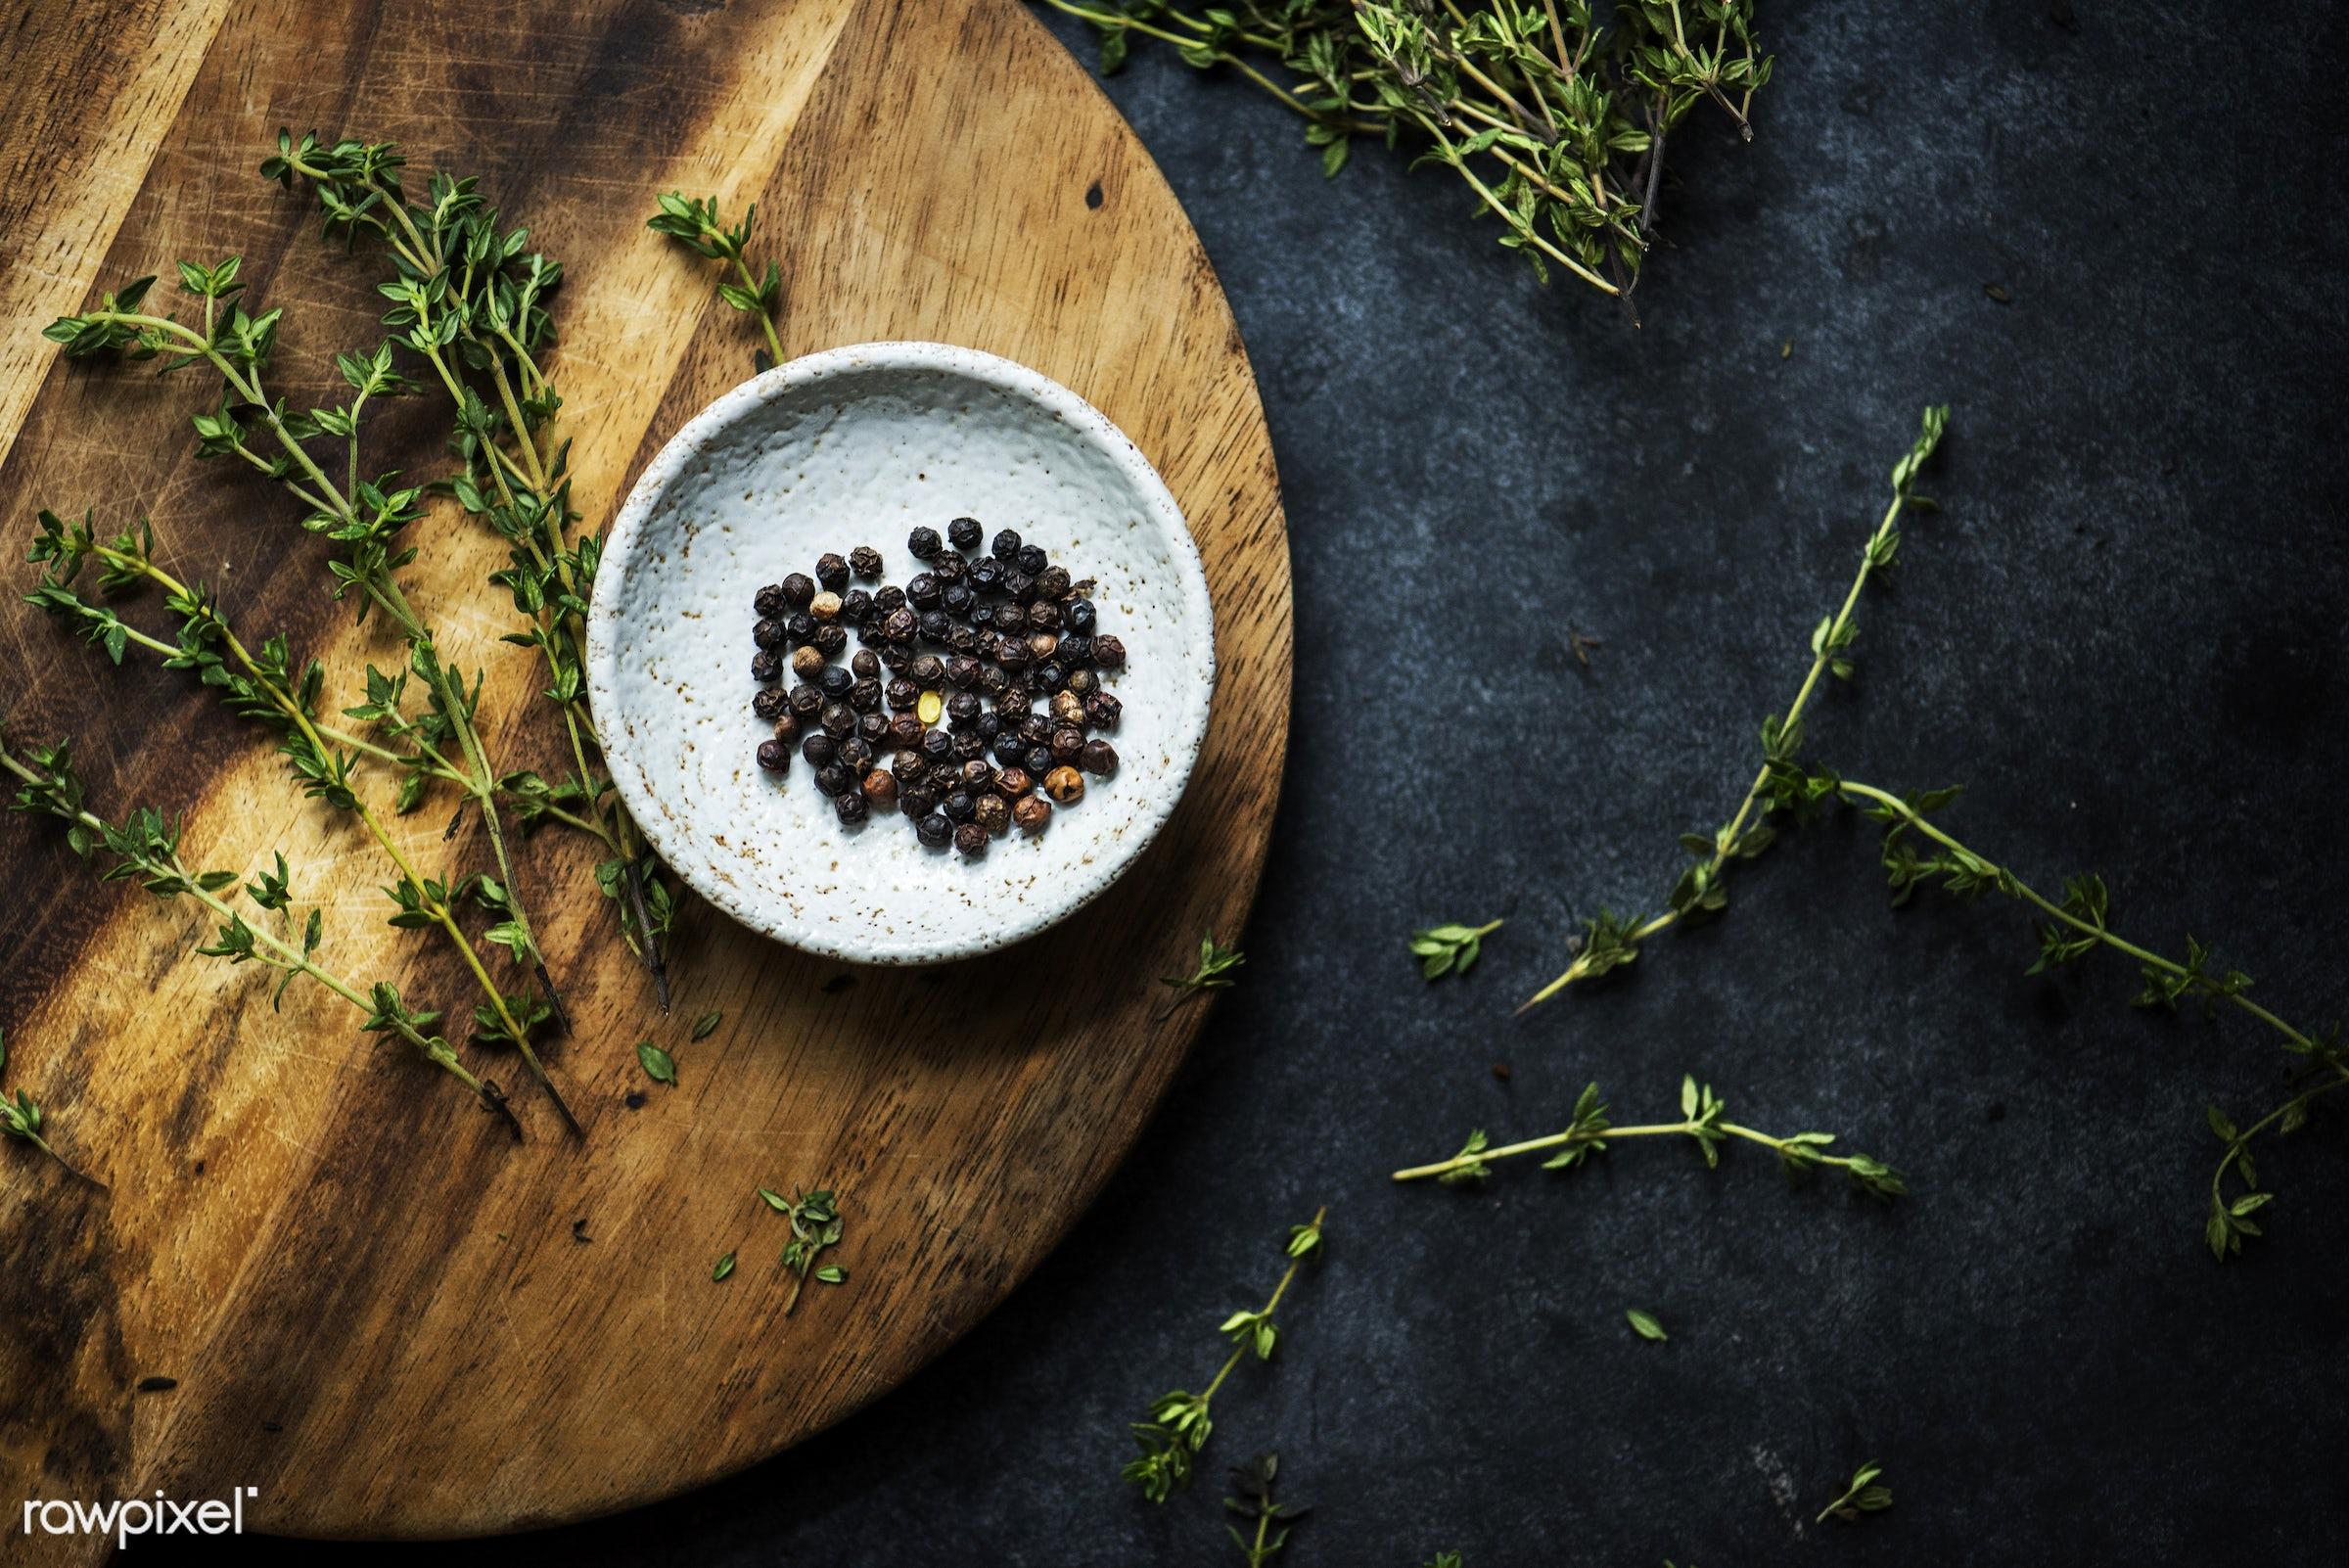 condiment, aroma, recipe, cuisine, choice, spice, powder, pepper, taste, seasoning, various, ingredient, gourmet, cook, dry...